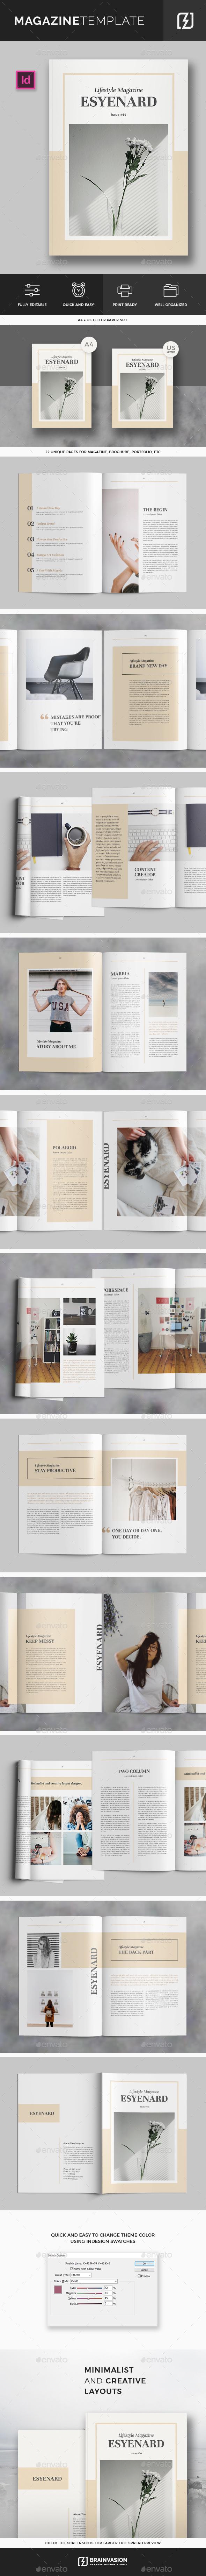 Magazine Template Vol.04 - Magazines Print Templates